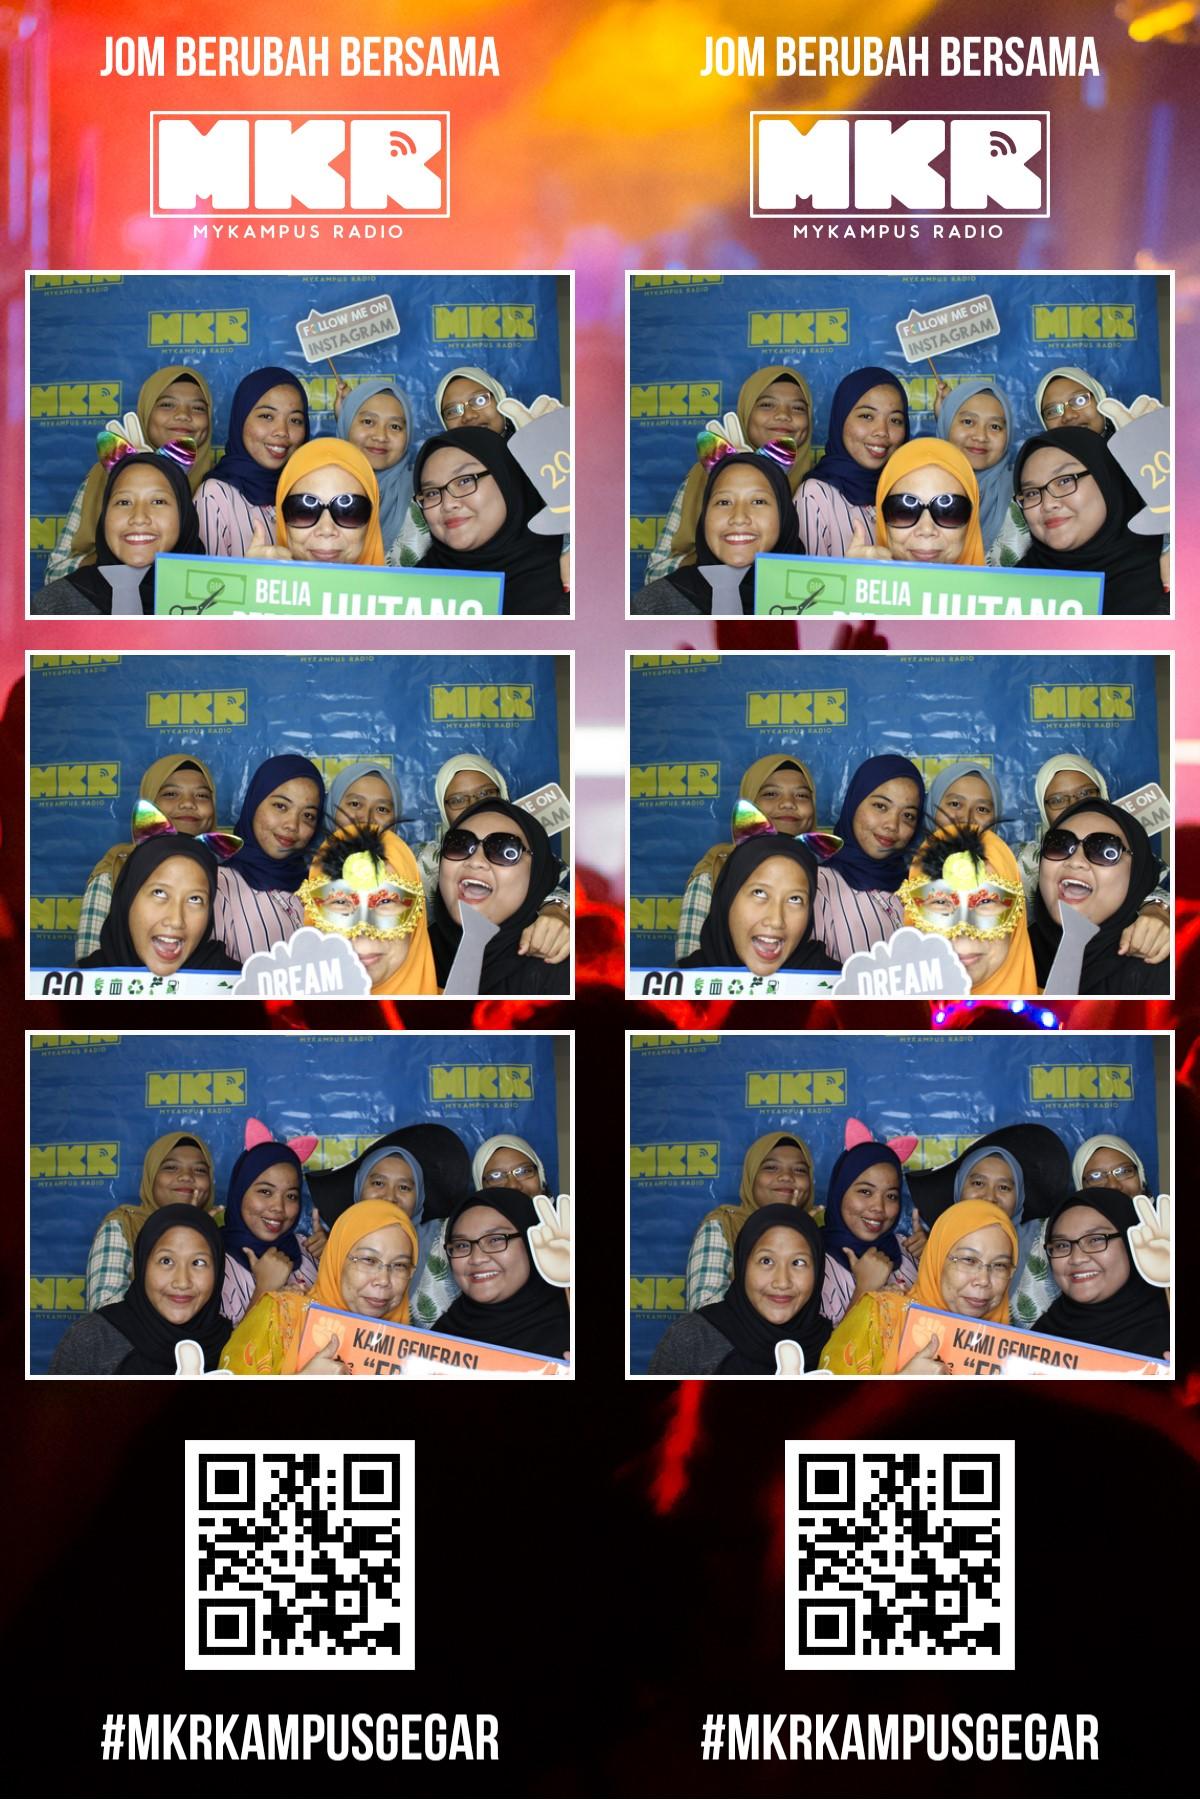 #MKRKampusGegar- Politeknik Nilai, Negeri Sembilan! (Photo booth)